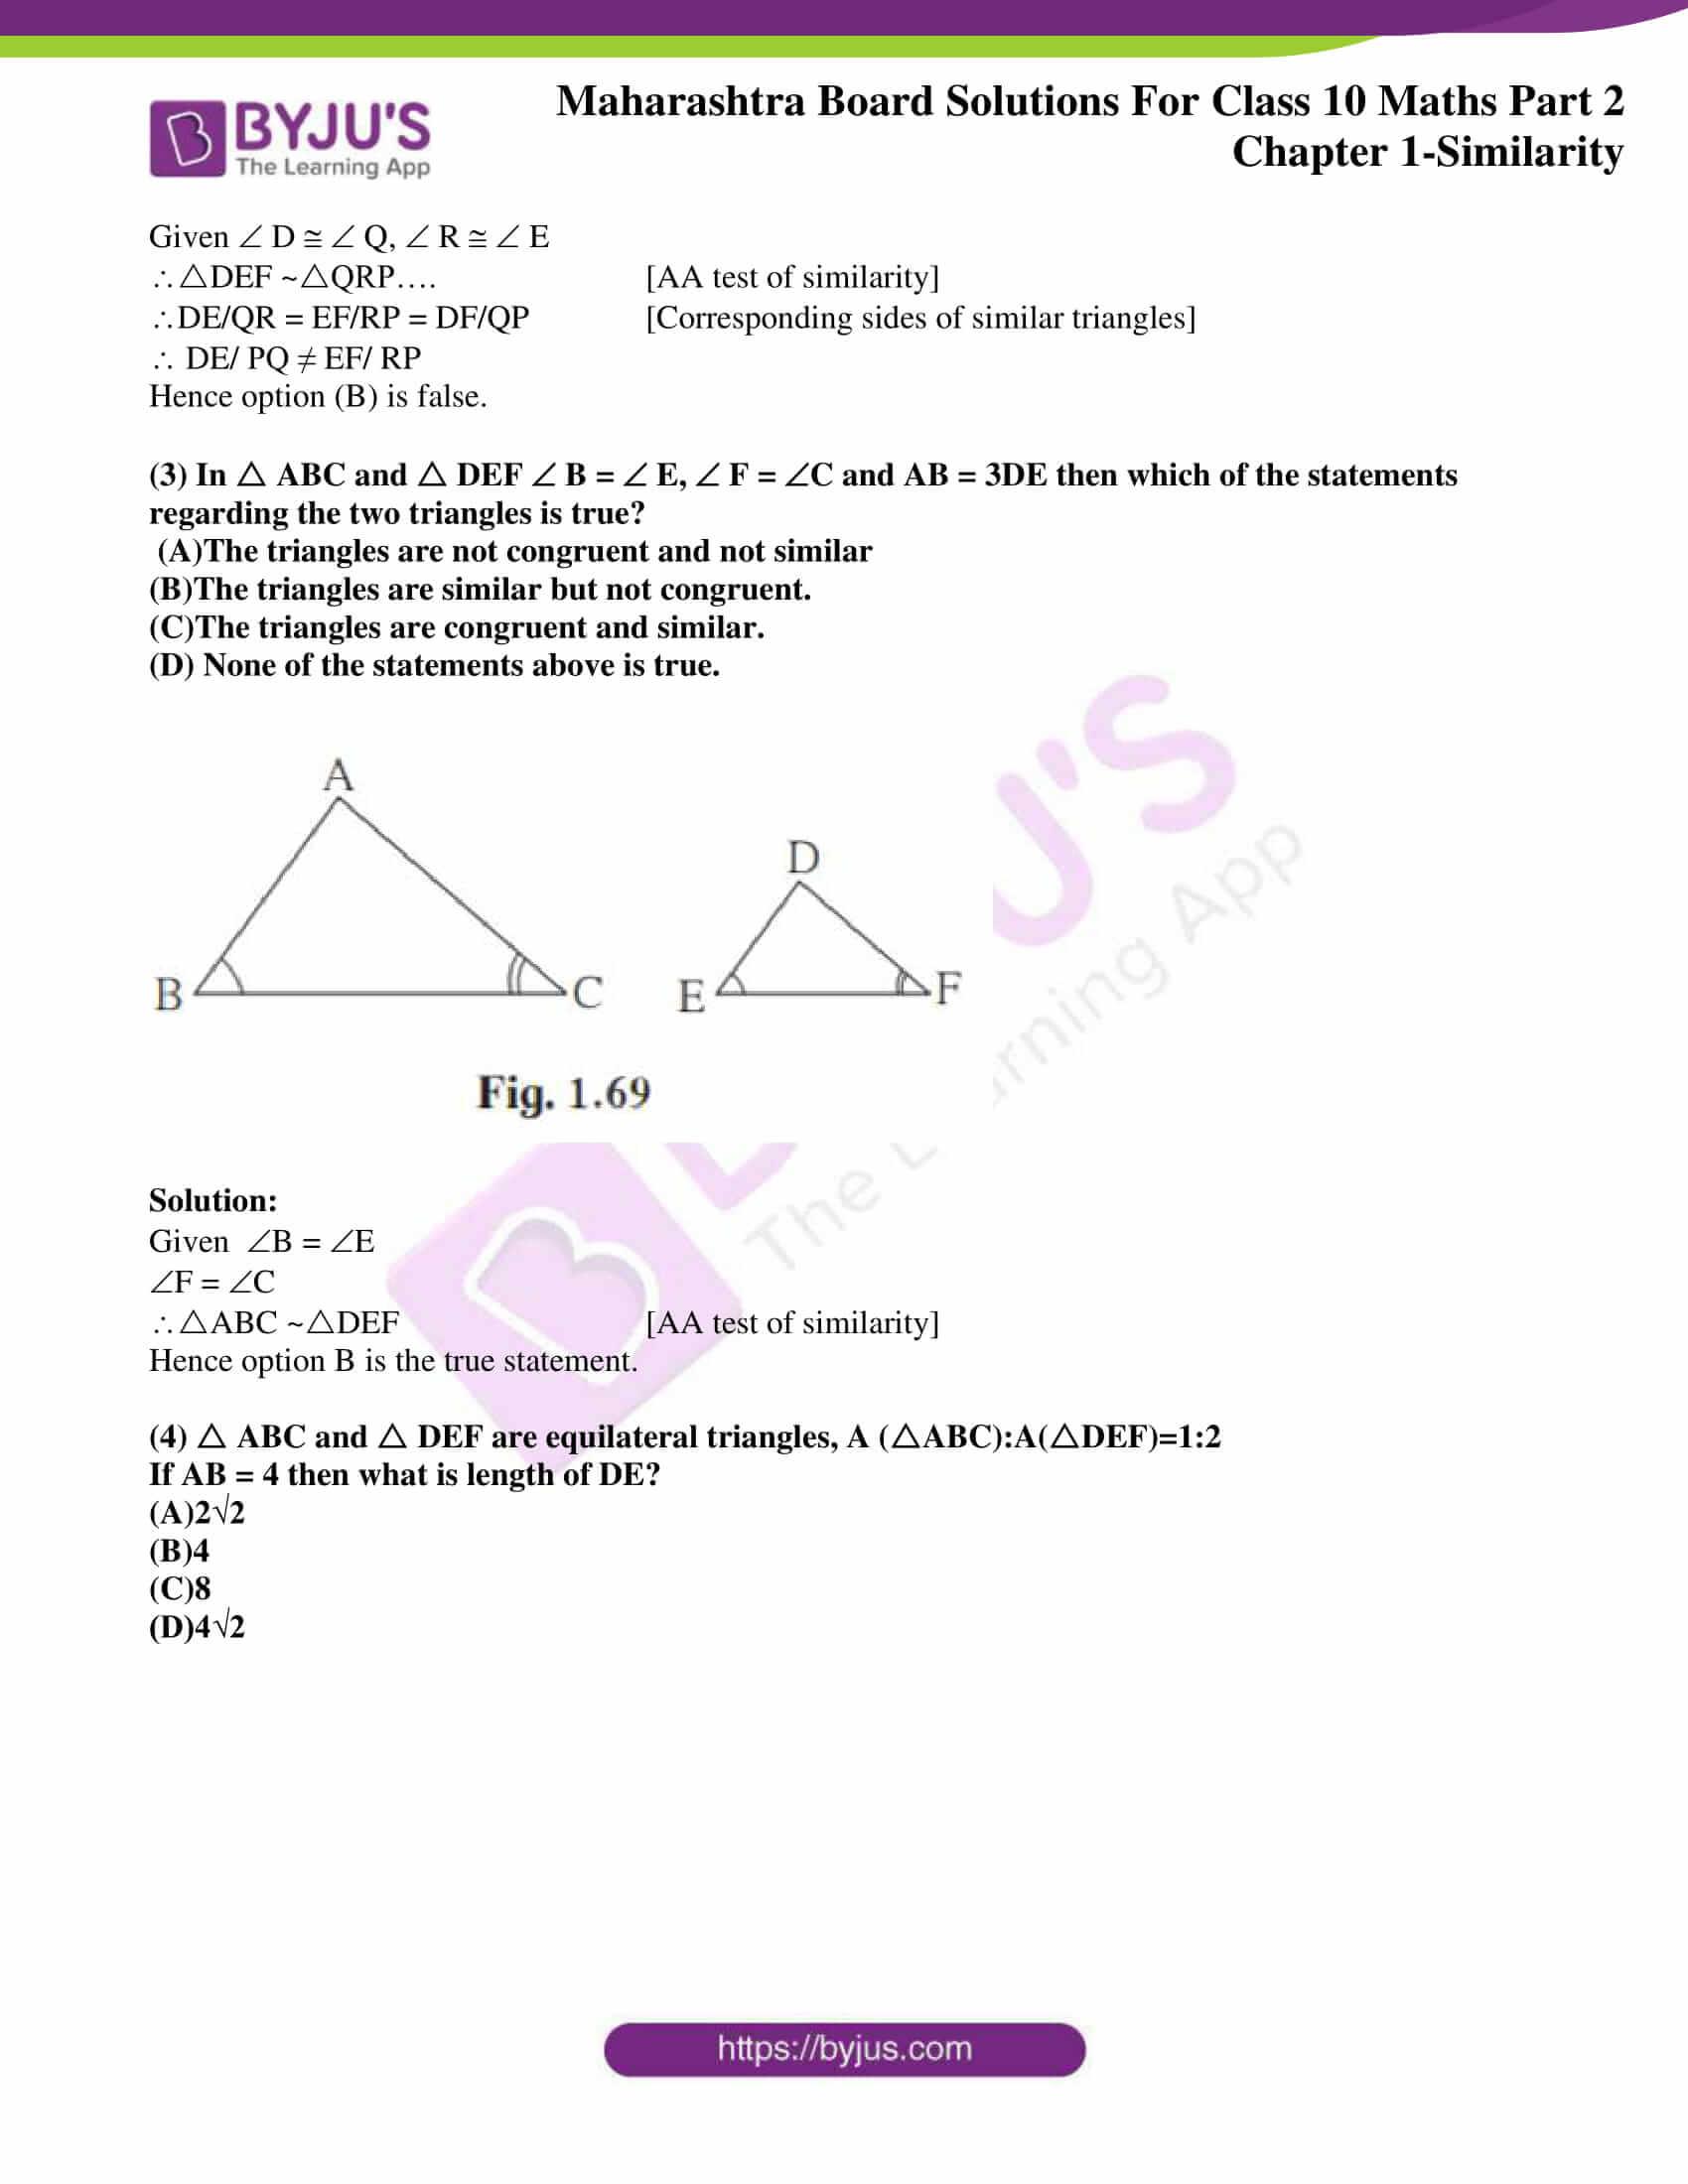 msbshse sol class 10 maths part 2 chapter 1 19